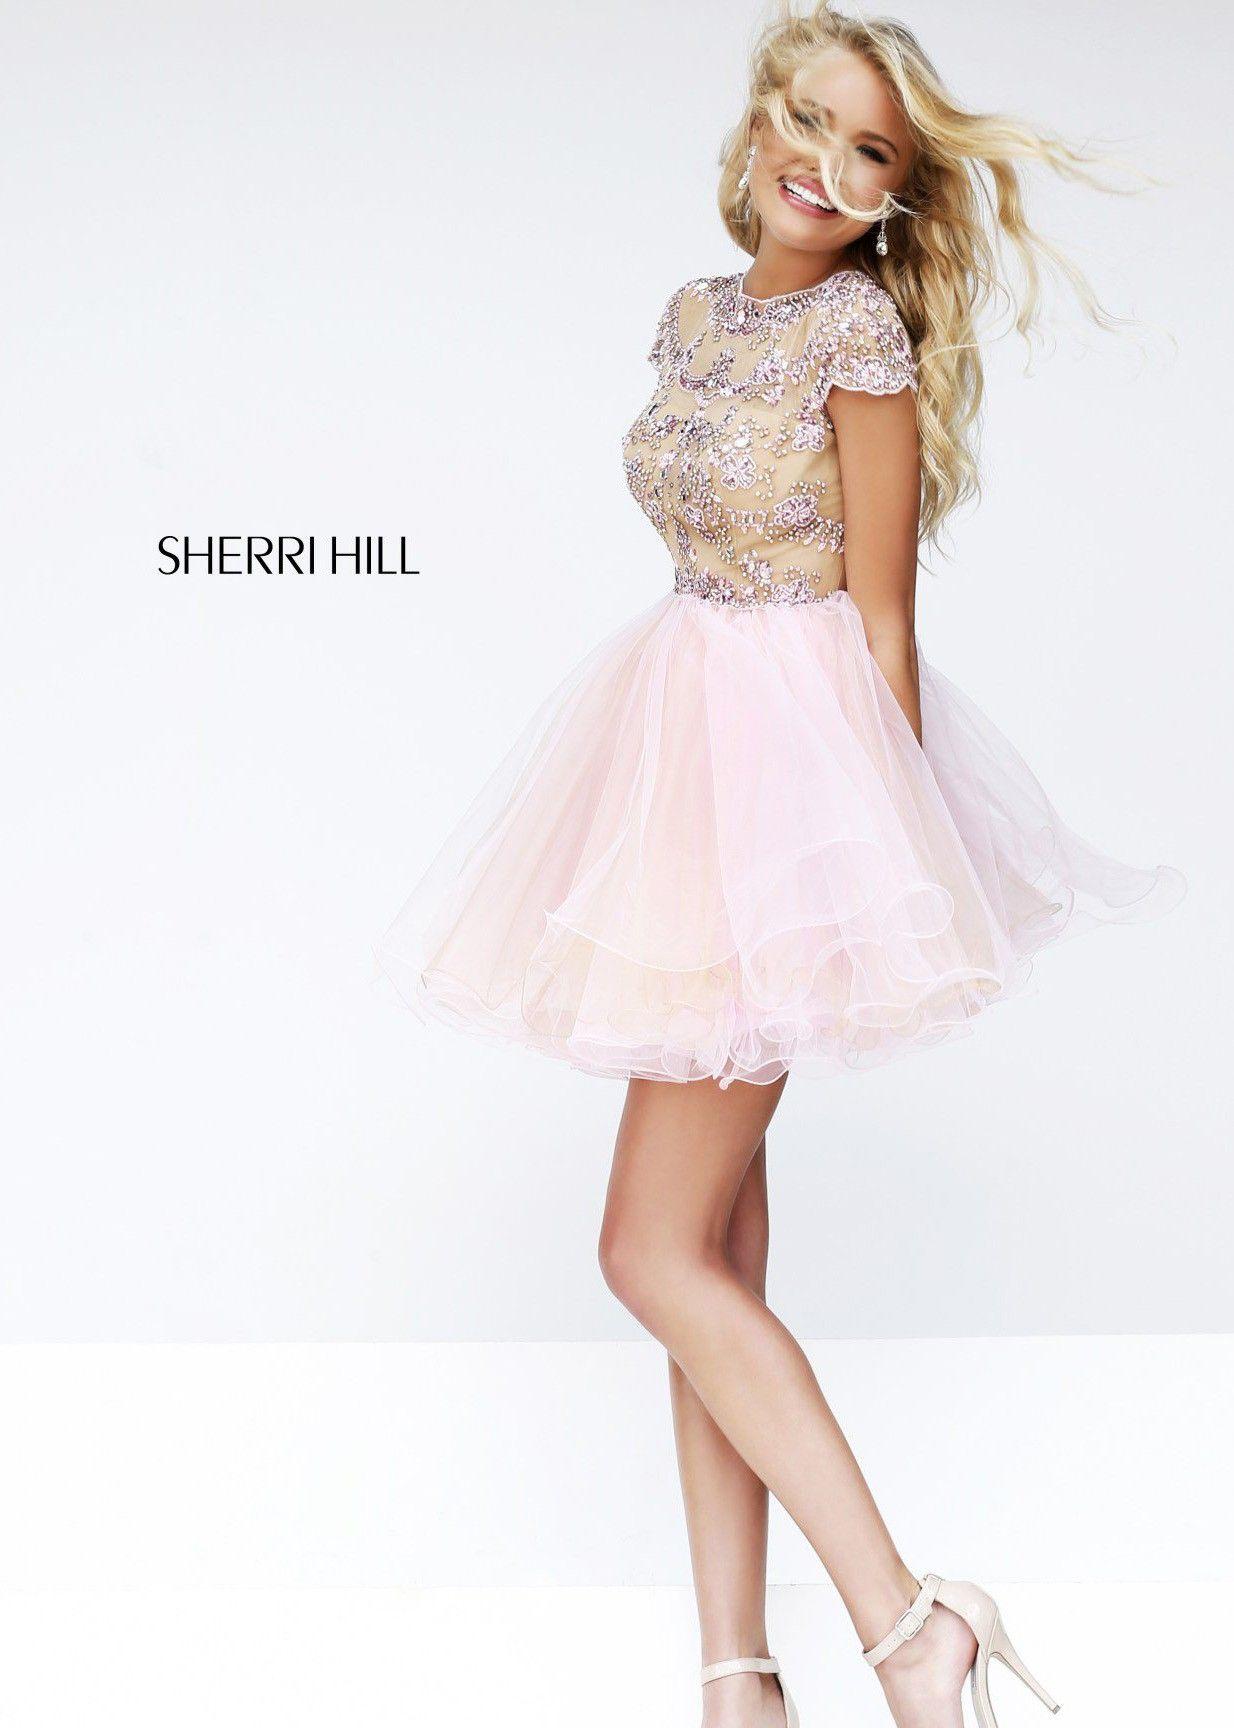 Sherri Hill-Flirty Cocktail Dress | vestidos | Pinterest | Kleider